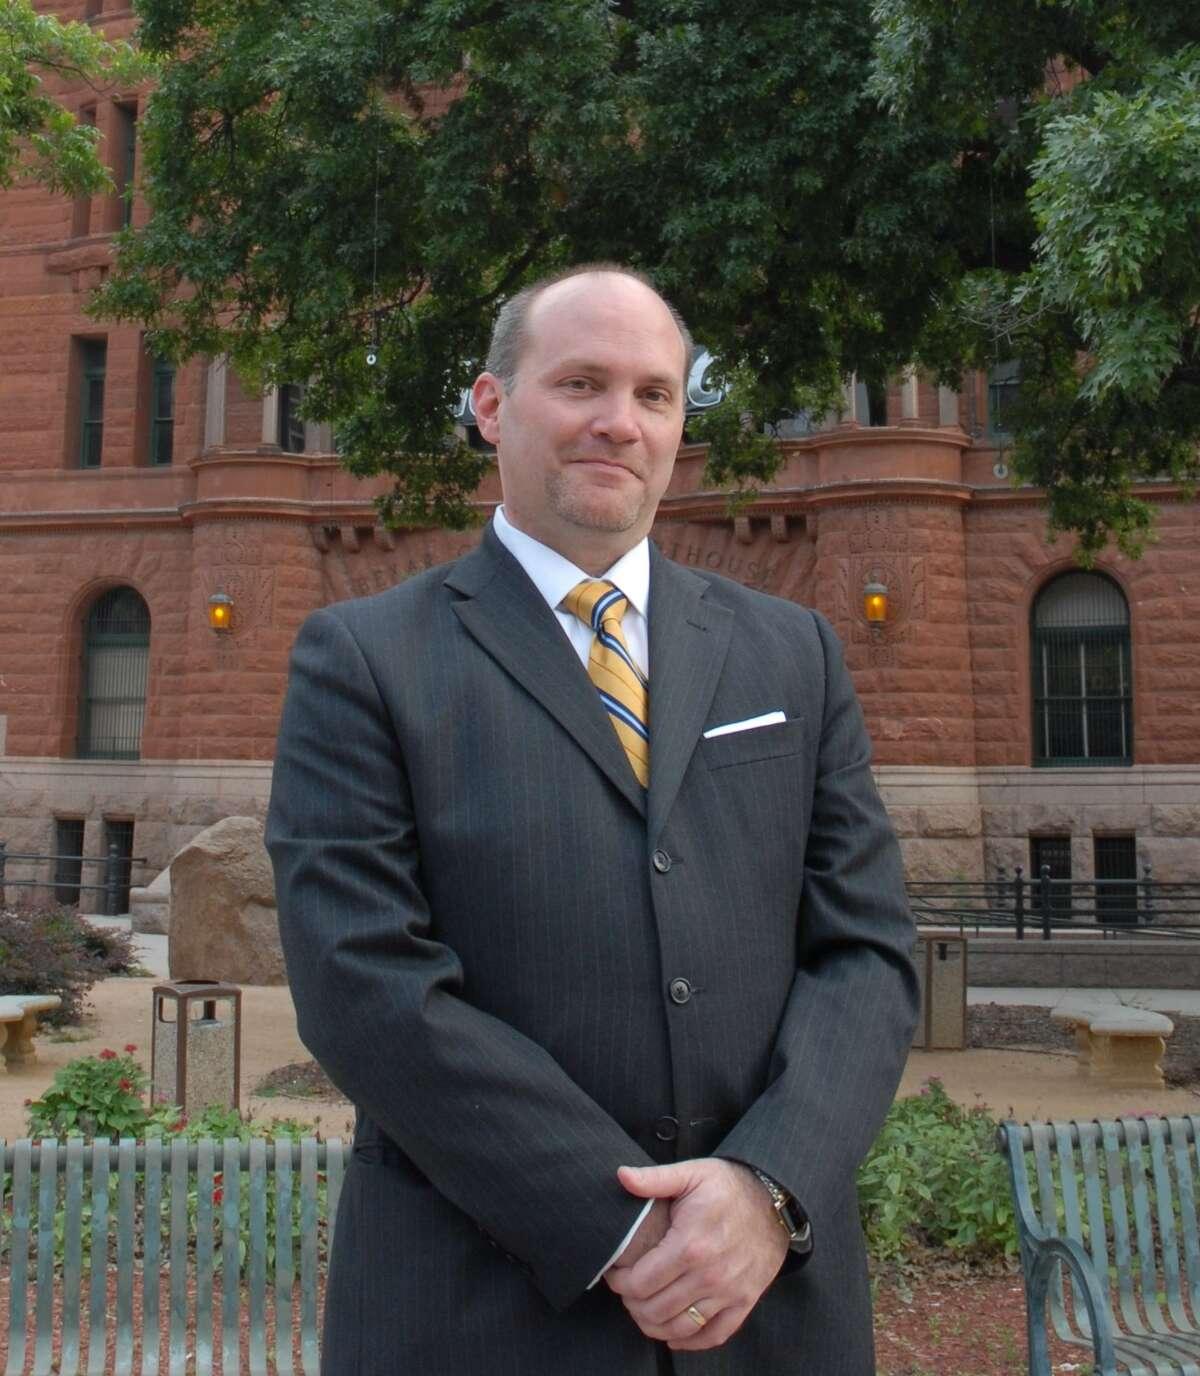 David Smith, Bexar County manager